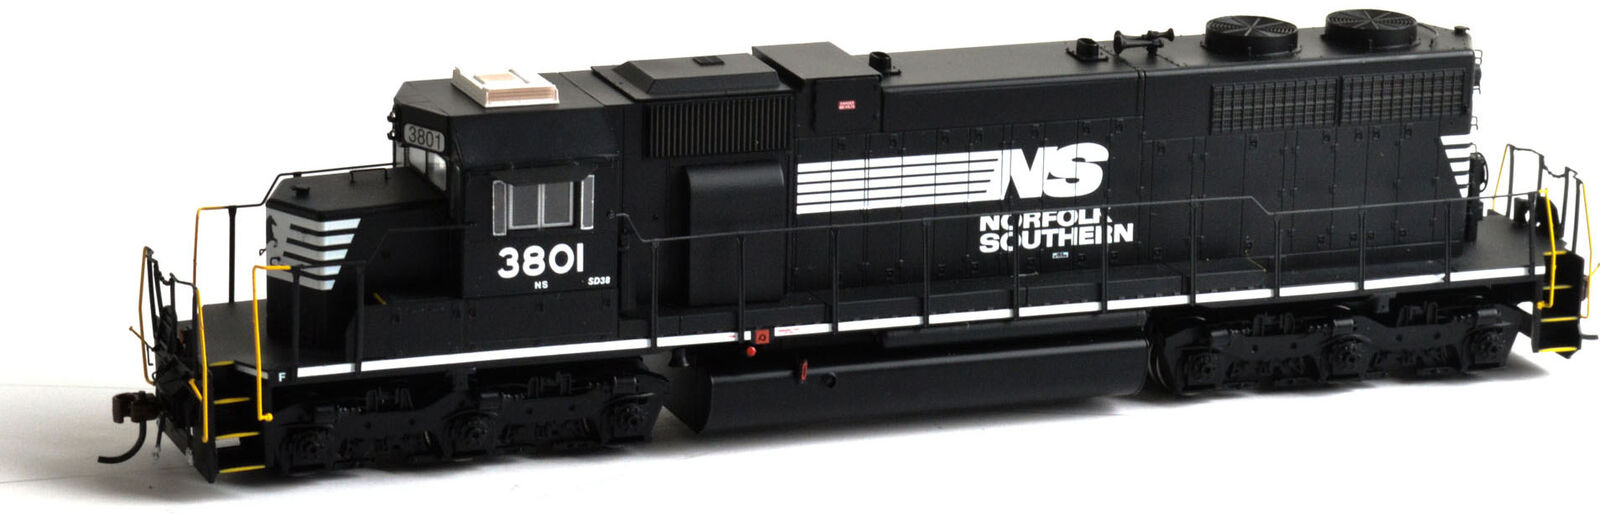 Athearn HO Scale EMD SD38 Diesel Locomotive Norfolk Southern NS